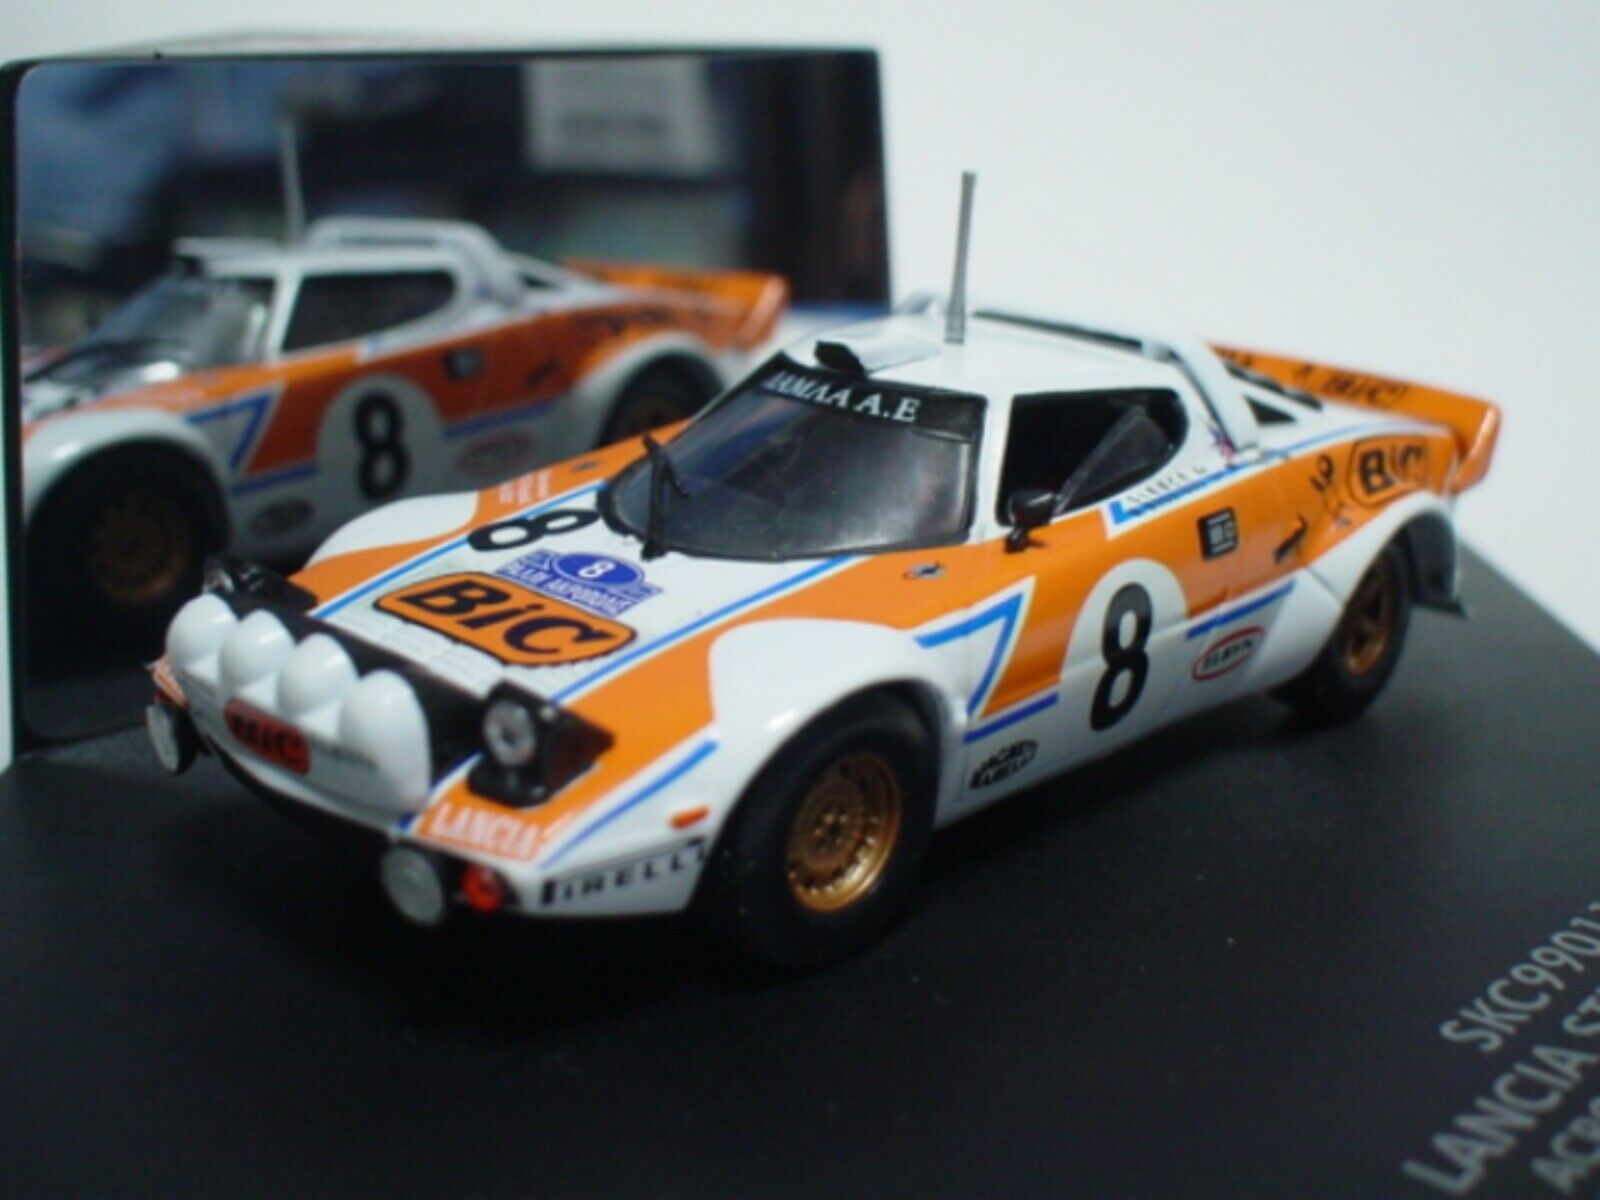 WOW EXTREMELY  RARE Lancia Stratos HF 8 Bic Acropolis 1978 WRC 1 43 Vitesse  HPI  à vendre en ligne